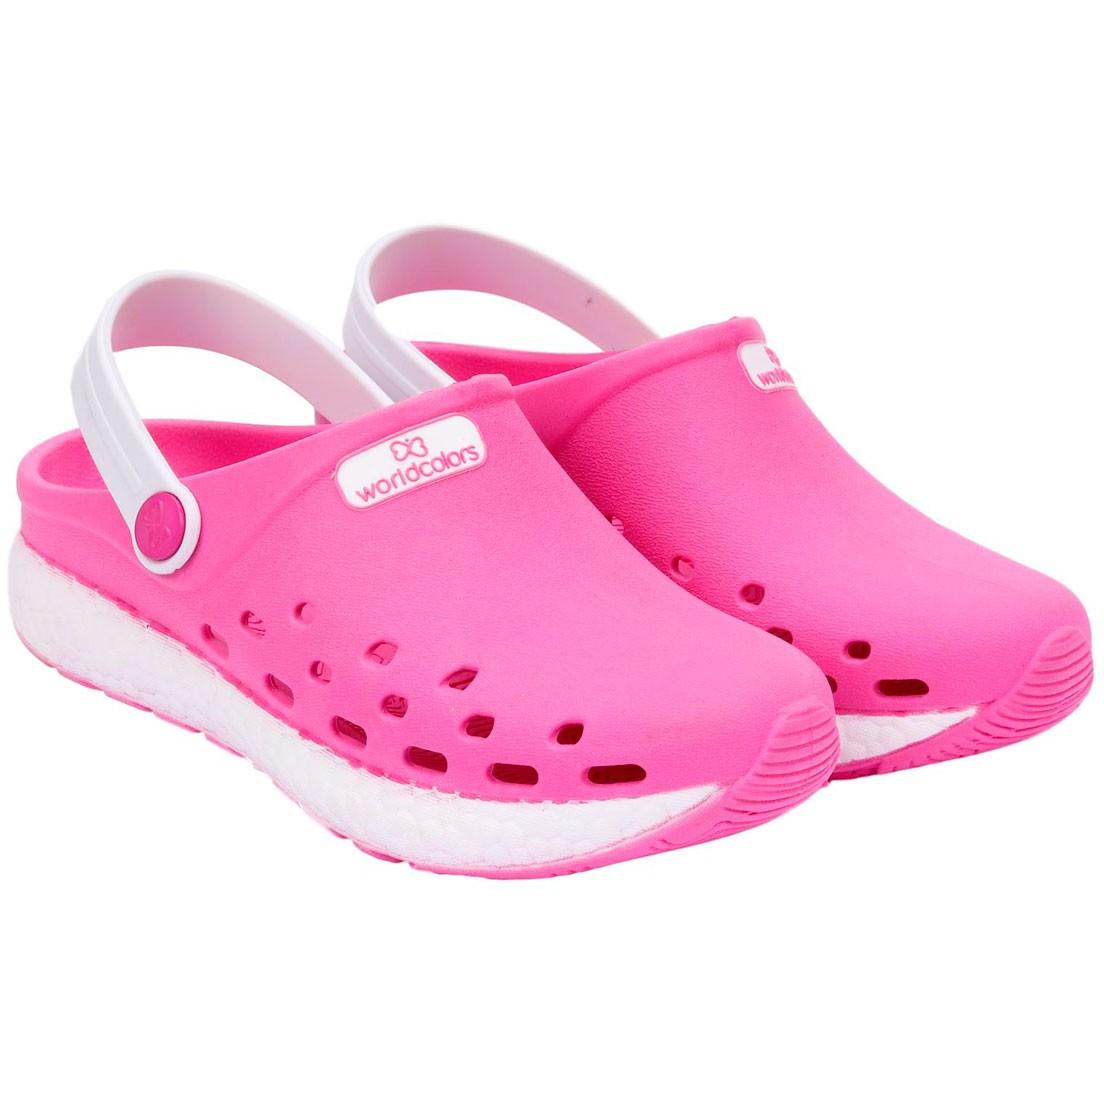 Babuche World Colors Pink/Branco Feminino 130 0021507